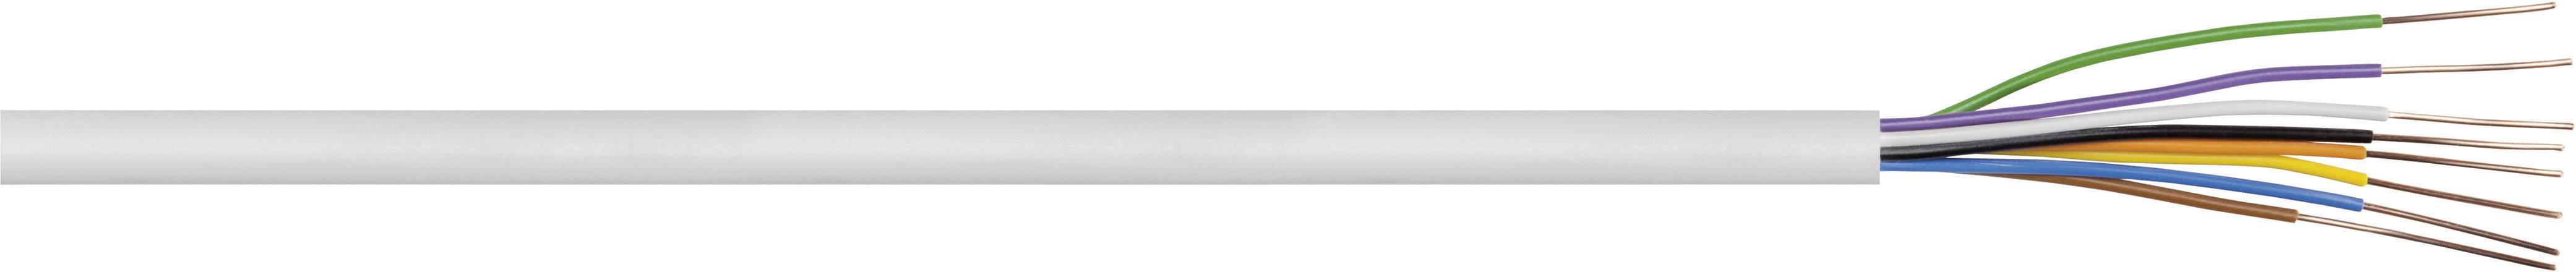 Zvonkový kabel, 4 x 0,8 mm, bílá, 1 m